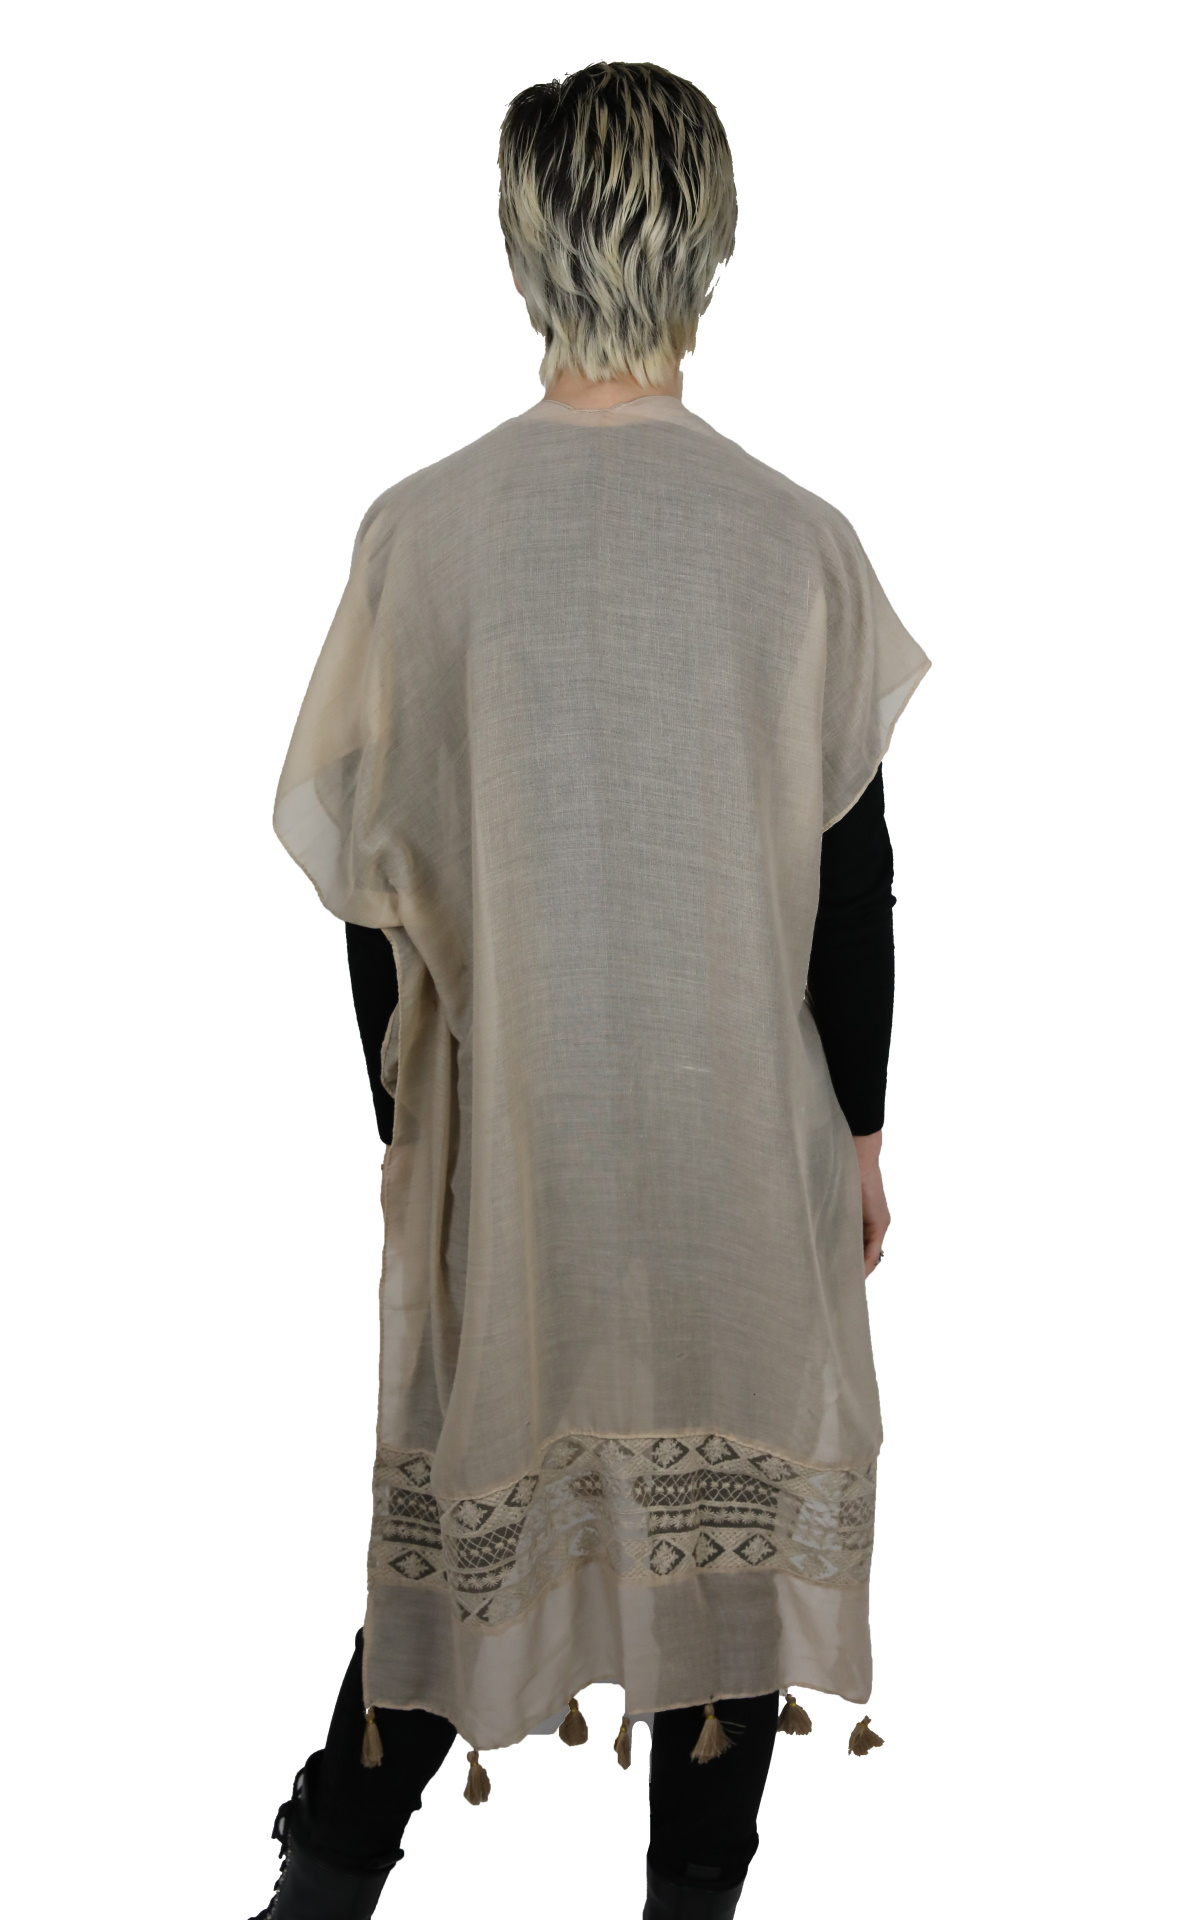 CLOTHES173 STOLA DONNA FOULARD CARDIGAN COPRISPALLE 1 1stAmerican elegante stola da donna foulard cardigan coprispalle